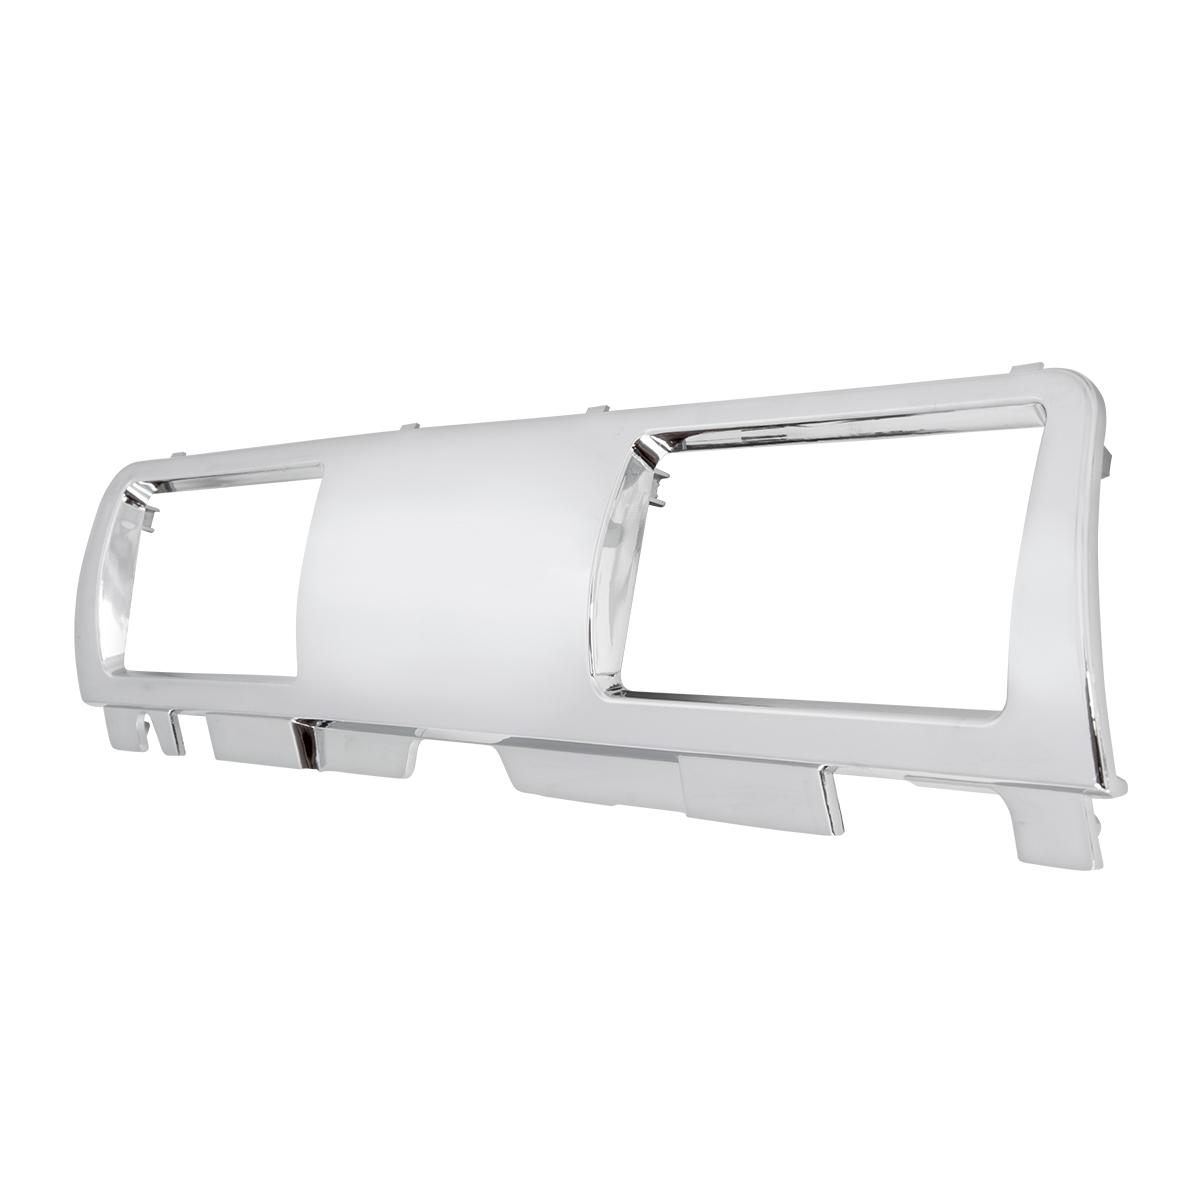 Glove Box Upper AC Vent Trim for Kenworth T680 2015+